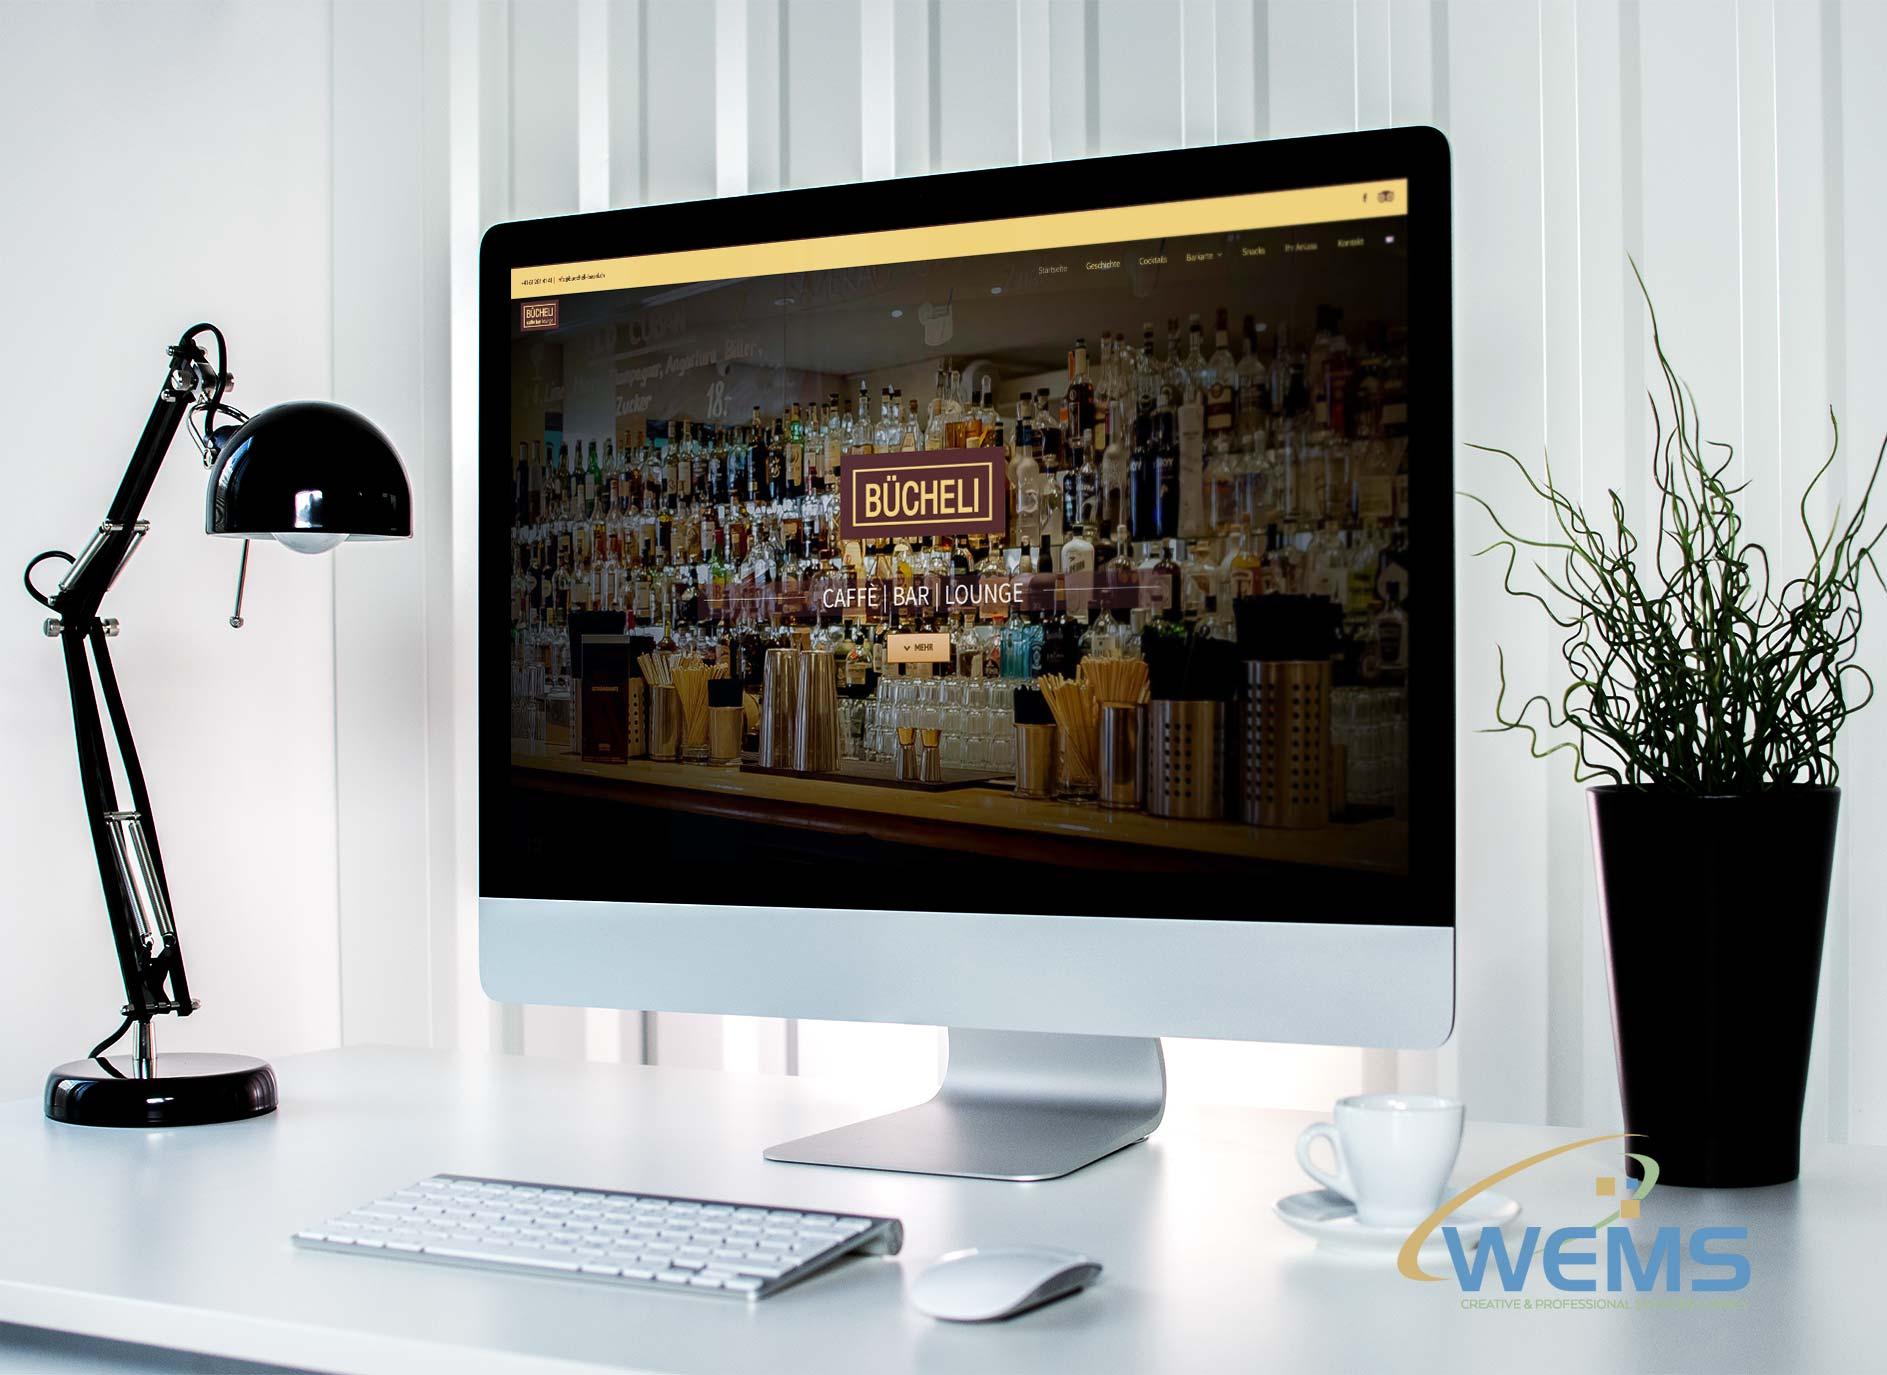 wems agency webdesign mockup bücheli basel 1 - Webdesign et optimisation pour les moteurs de recherche (SEO)